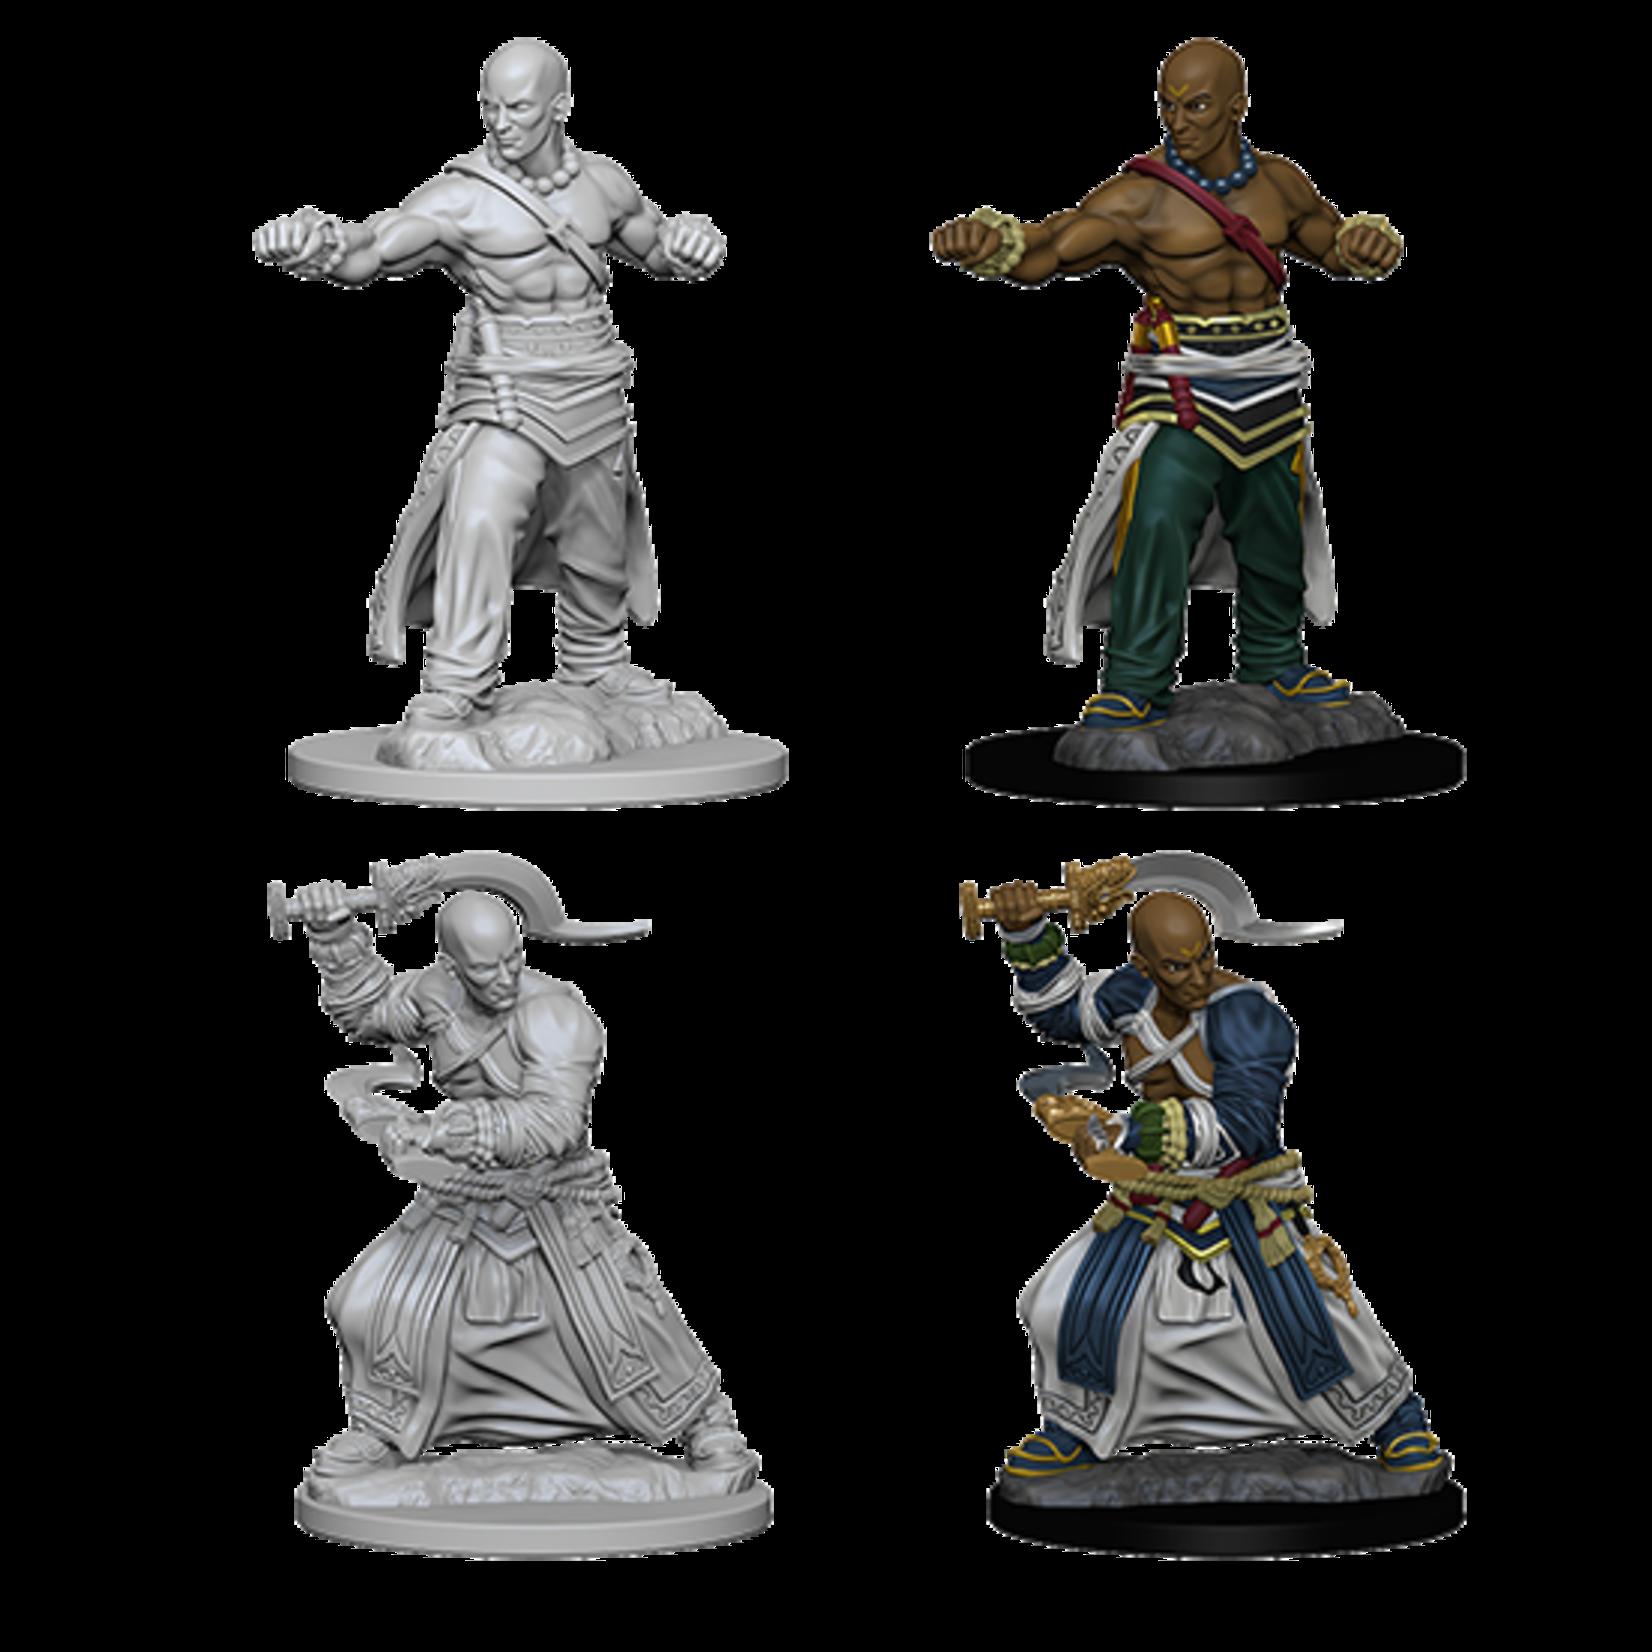 WizKids Pathfinder Deep Cuts Unpainted Miniatures: Human Male Monk (W1)